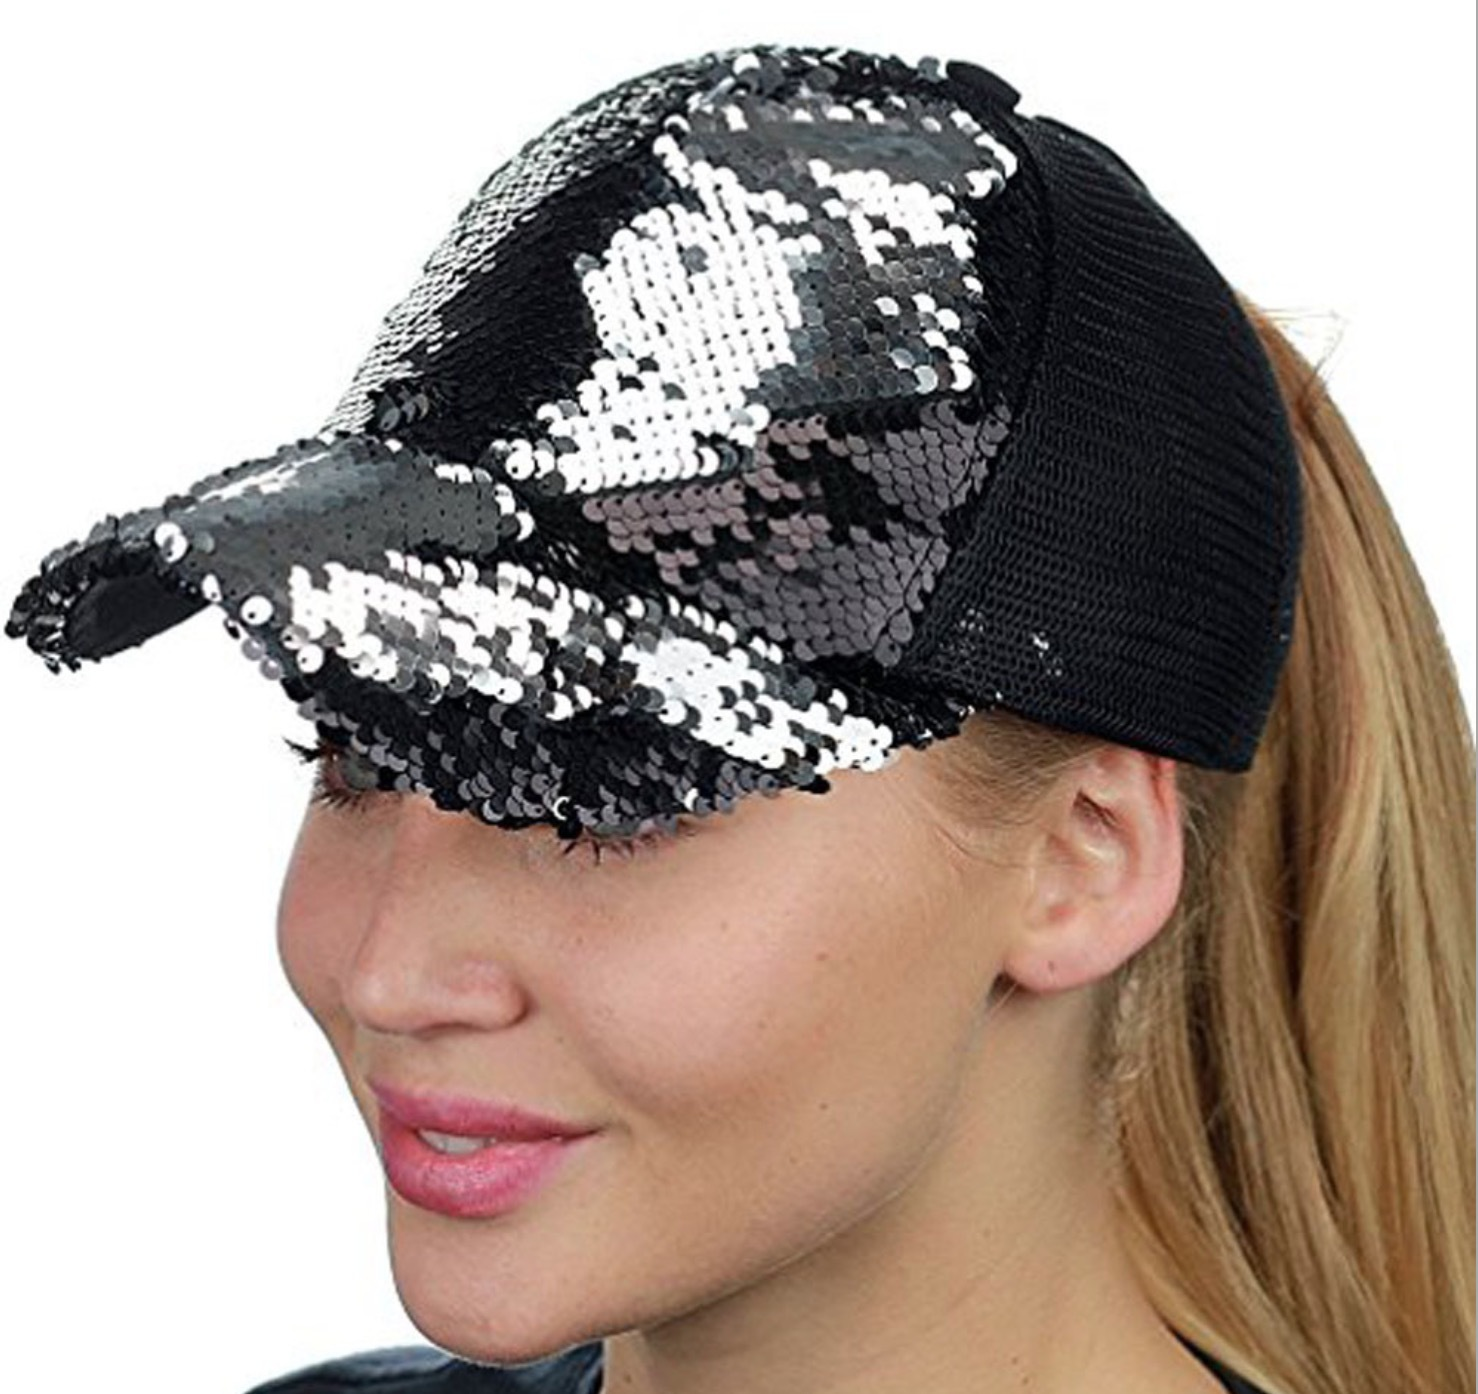 Women Baseball Cap Adjustable Sequins Peaked Cap Sports Casquette Hat -MX8